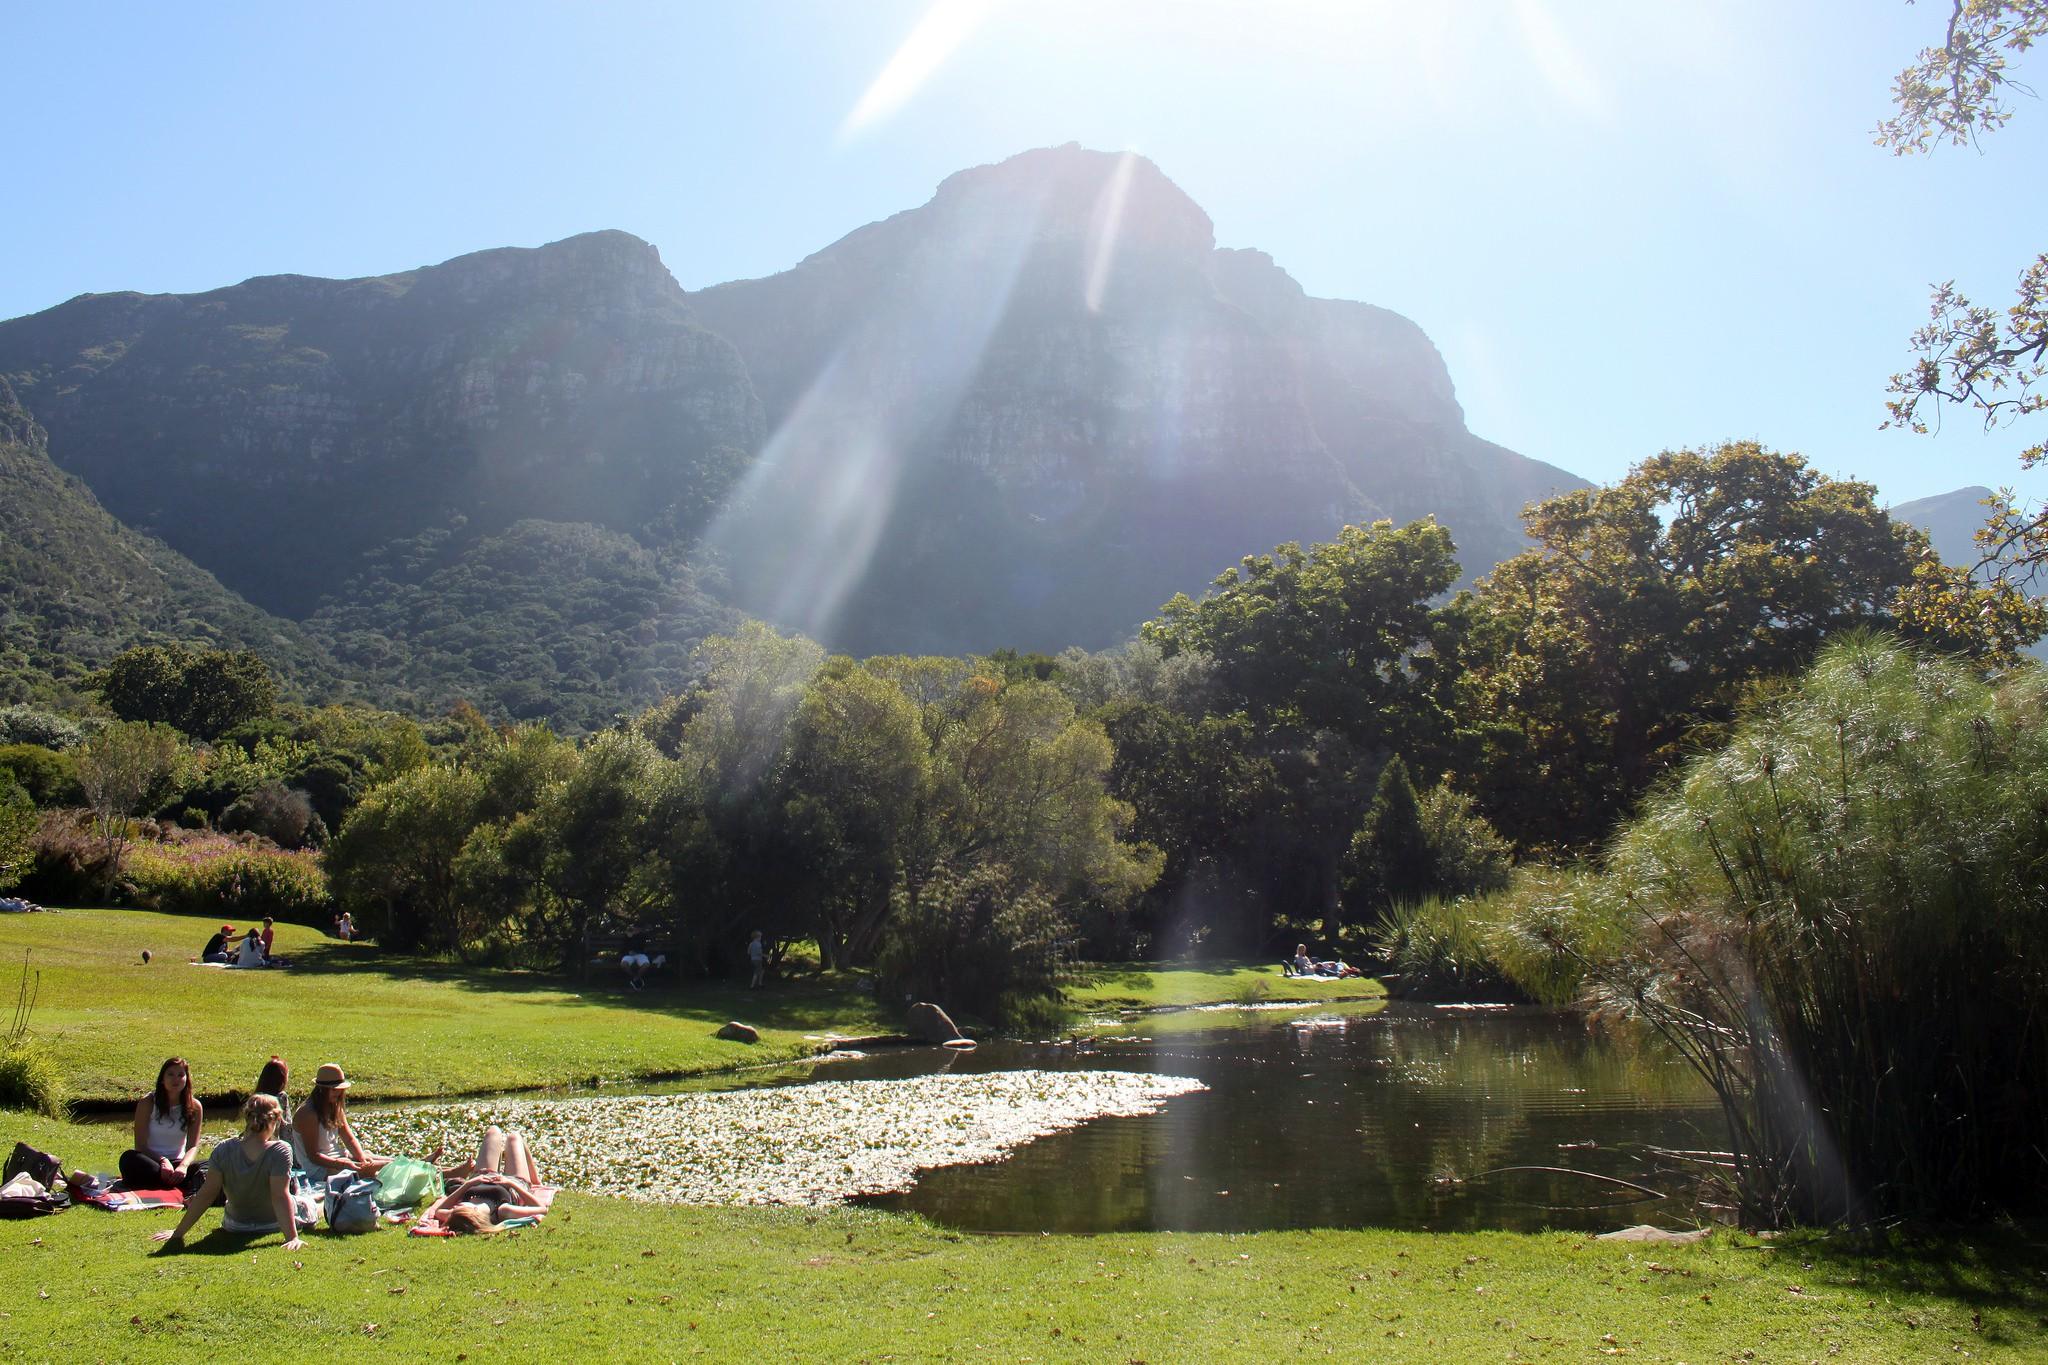 Picnicking at Kirstenbosch Botanical Garden